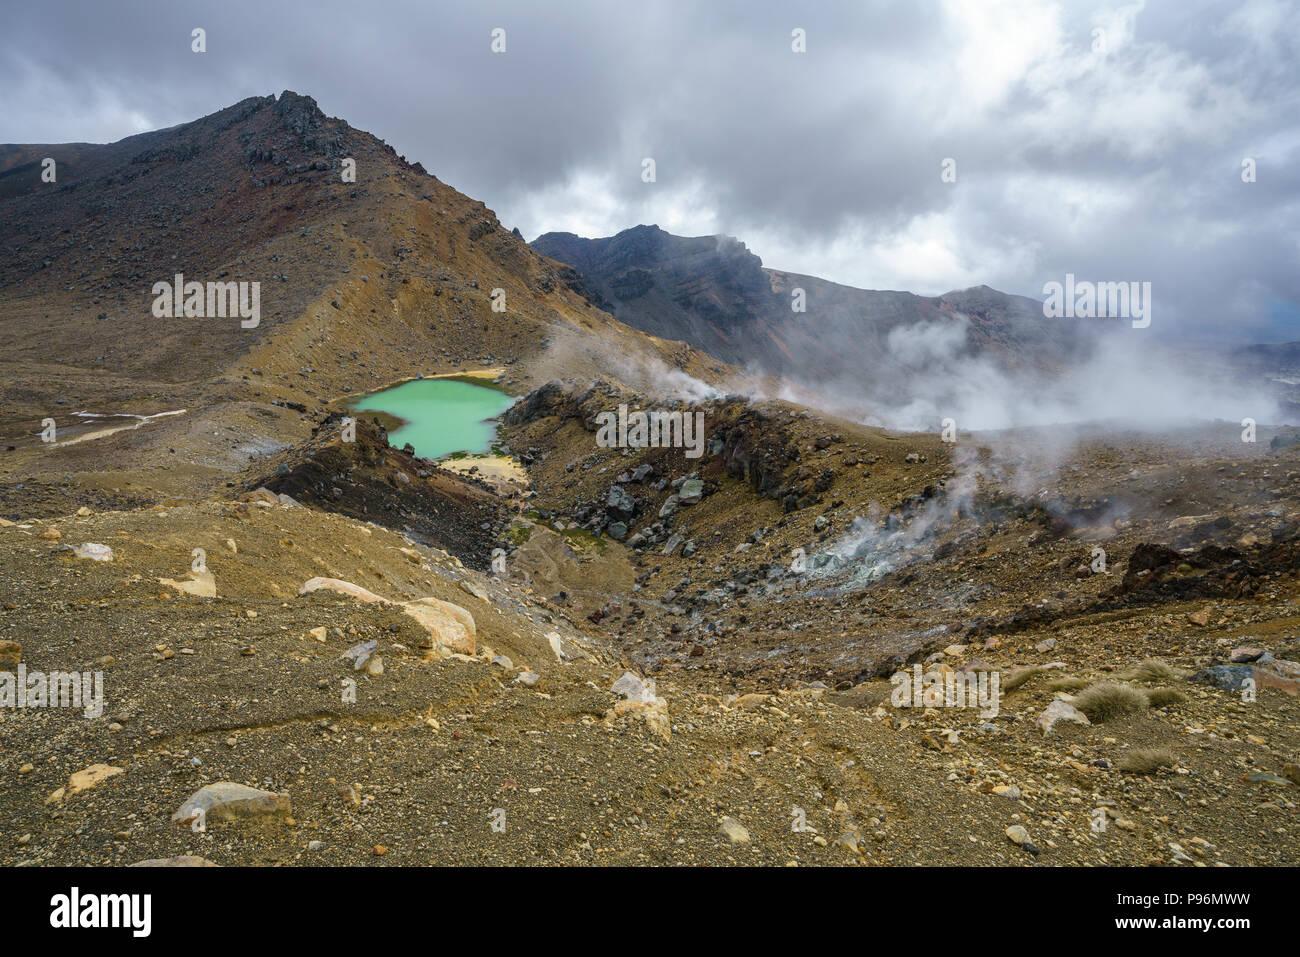 hiking the tongariro alpine crossing,lake and smoke in volcanic crater,new zealand - Stock Image